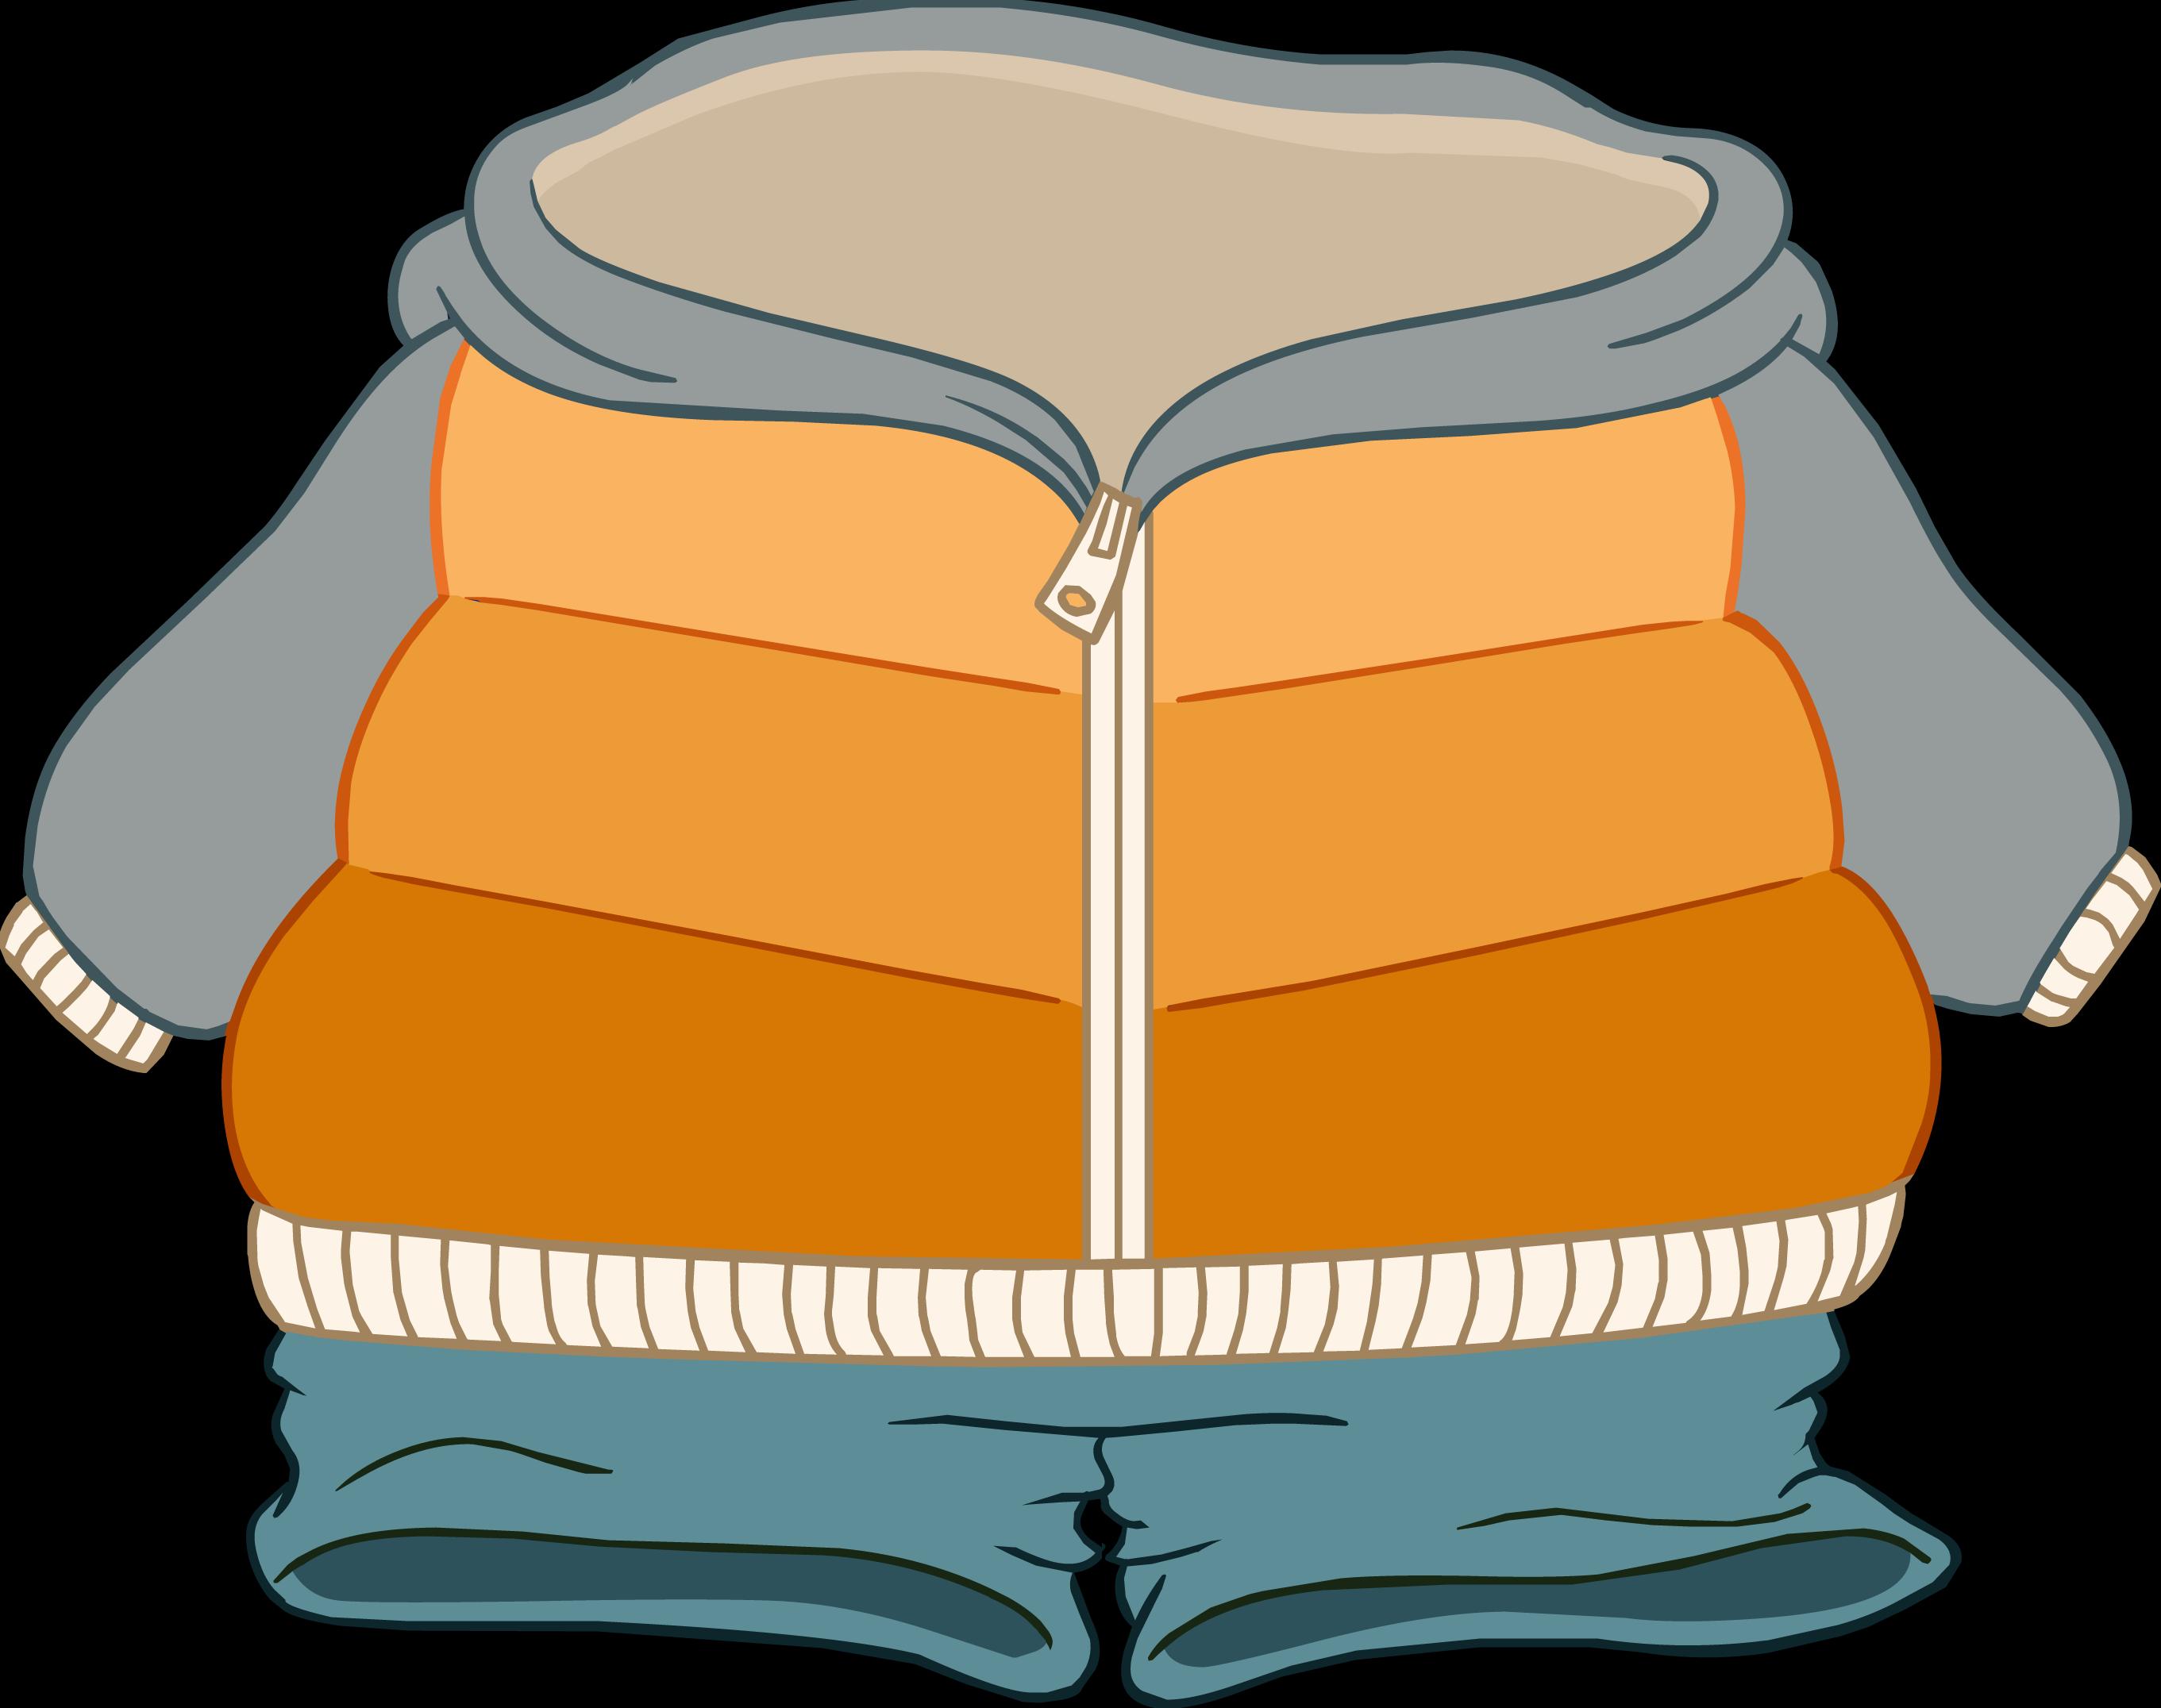 Igloo clipart tundra. Orange fade hoodie club